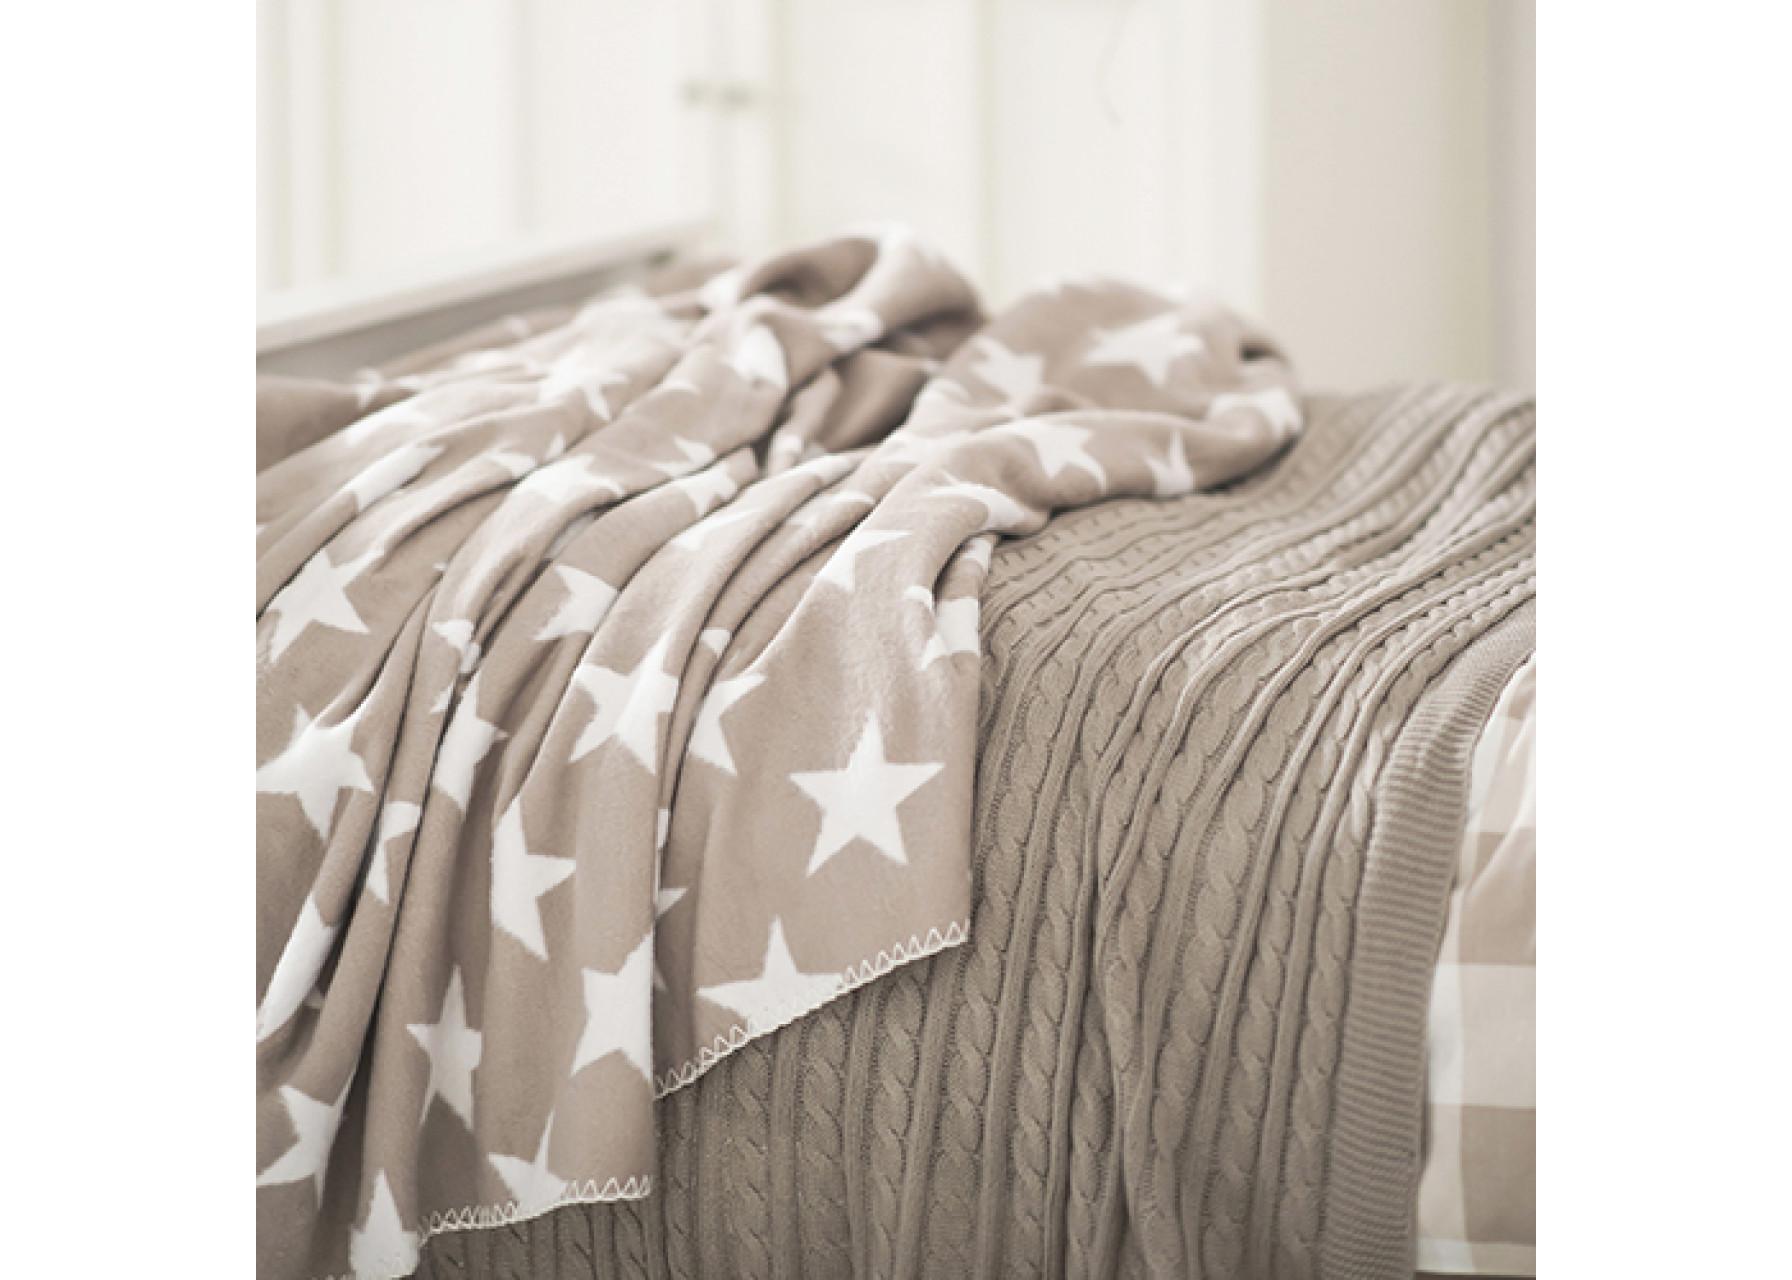 Kουβέρτα αστέρια / Μπεζ